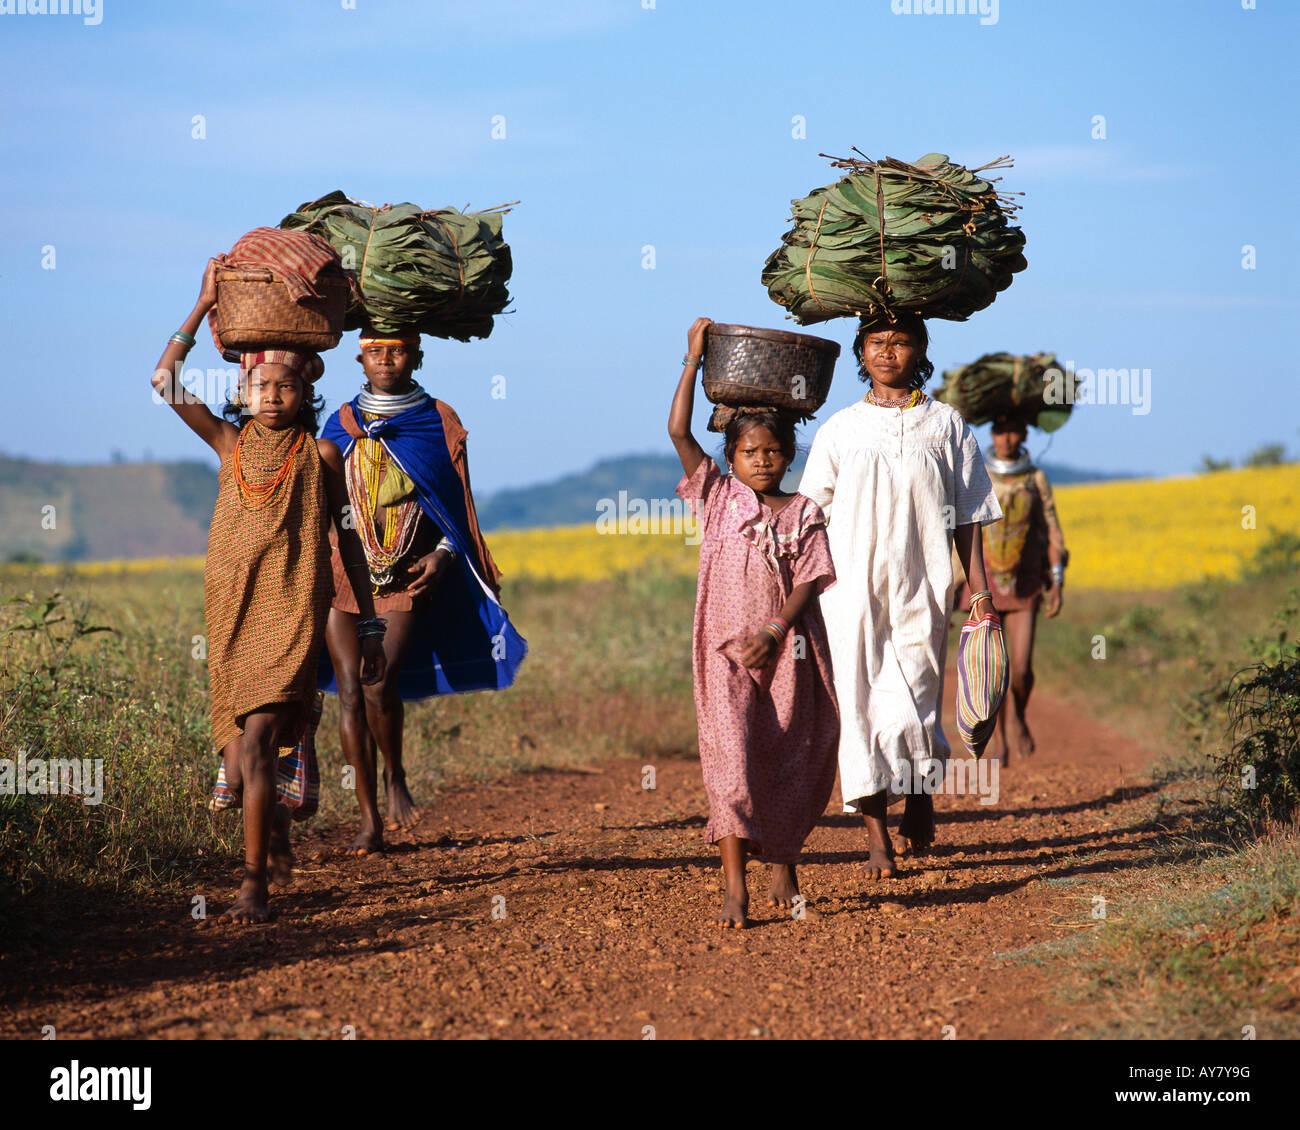 Bonda femmes tribales qui sera sur le marché, de l'Orissa, Inde Banque D'Images